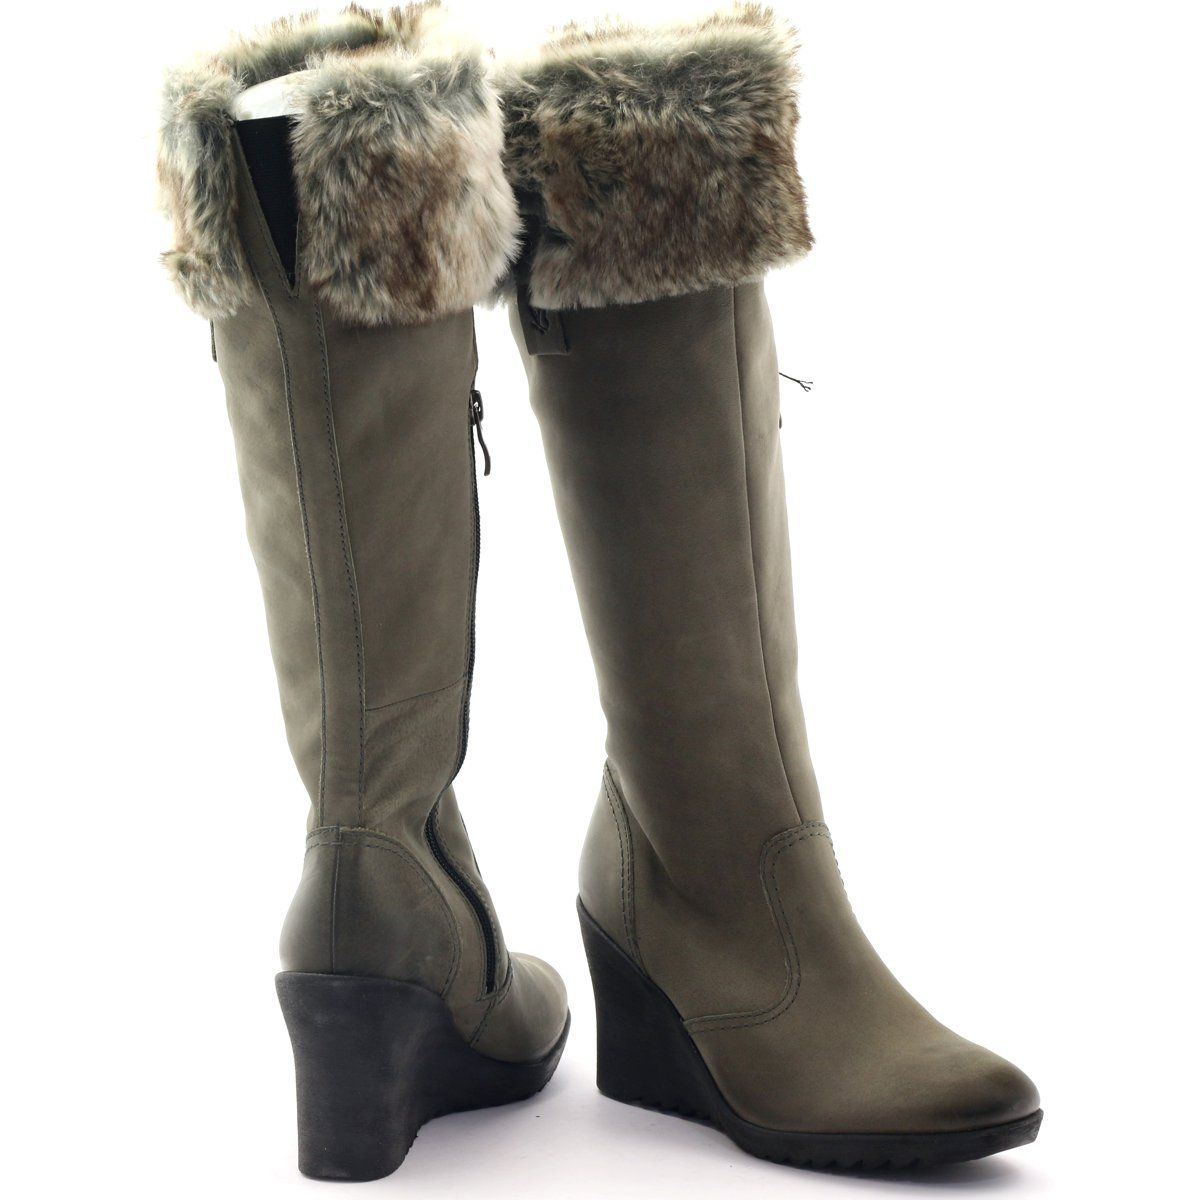 Caprice Kozaki Buty Damskie Skorzane 25607 Szare Boots Over Knee Boot Knee Boots